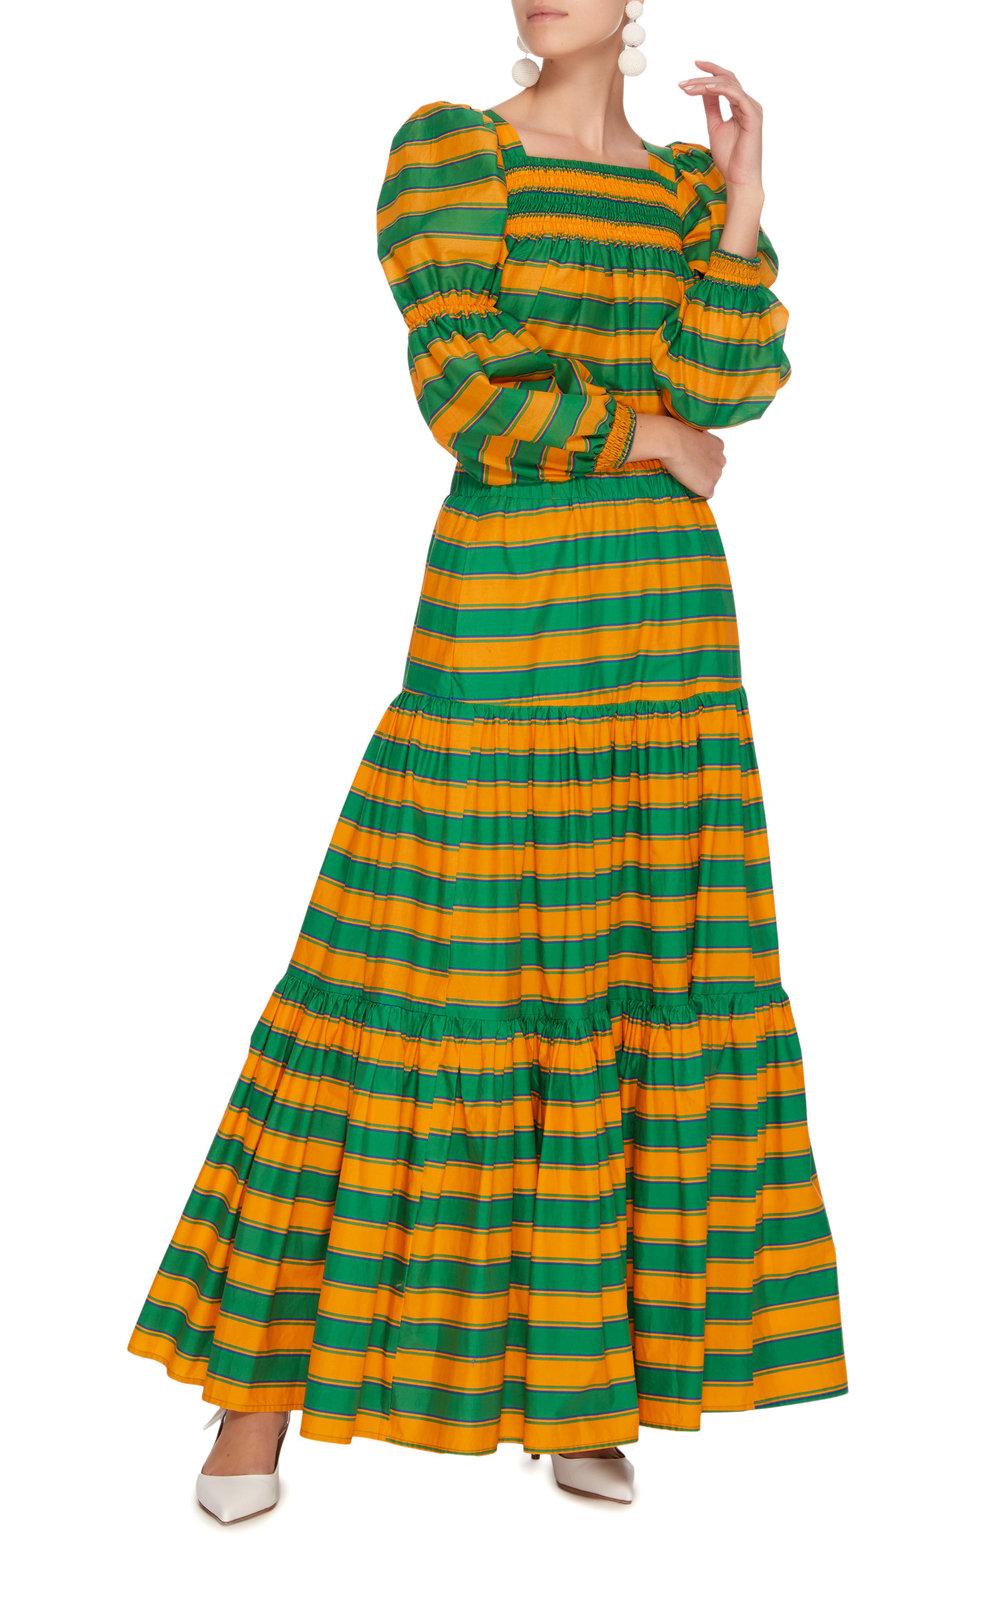 large_la-doublej-stripe-striped-cotton-maxi-skirt-1.jpg